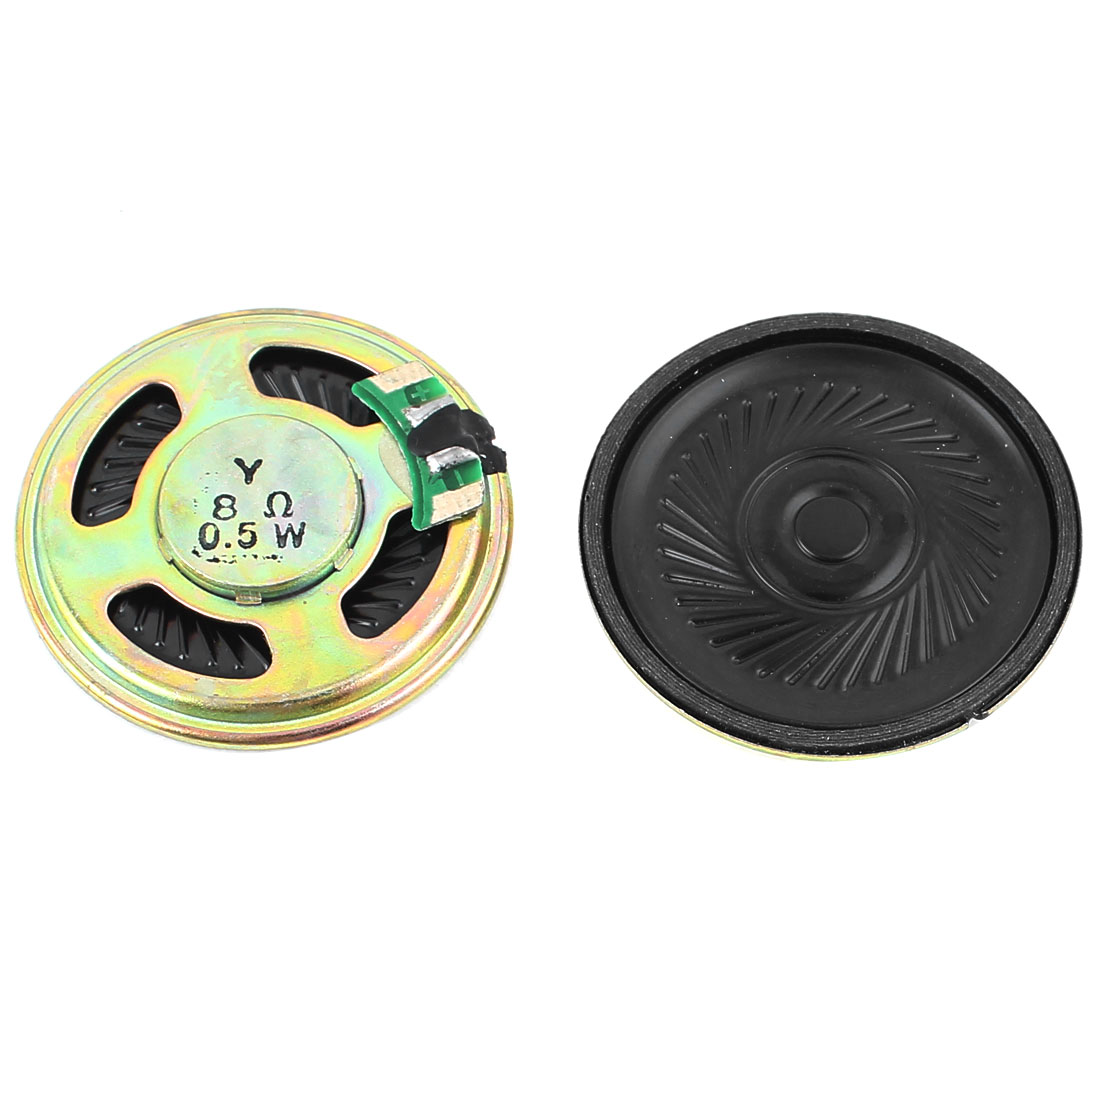 2 Pcs 0.5W 8 Ohm 40mm Round Inside Magnet Electronic Speaker Loudspeaker